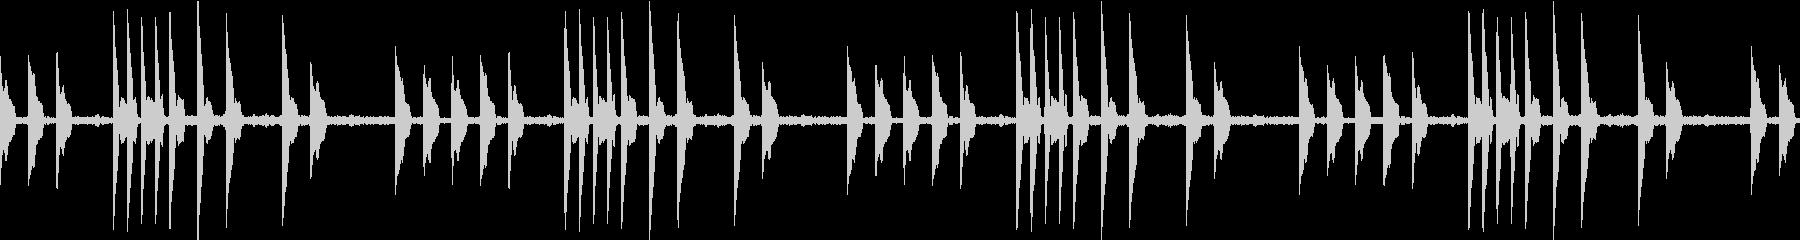 EDM リードシンセ 1 音楽制作用の未再生の波形